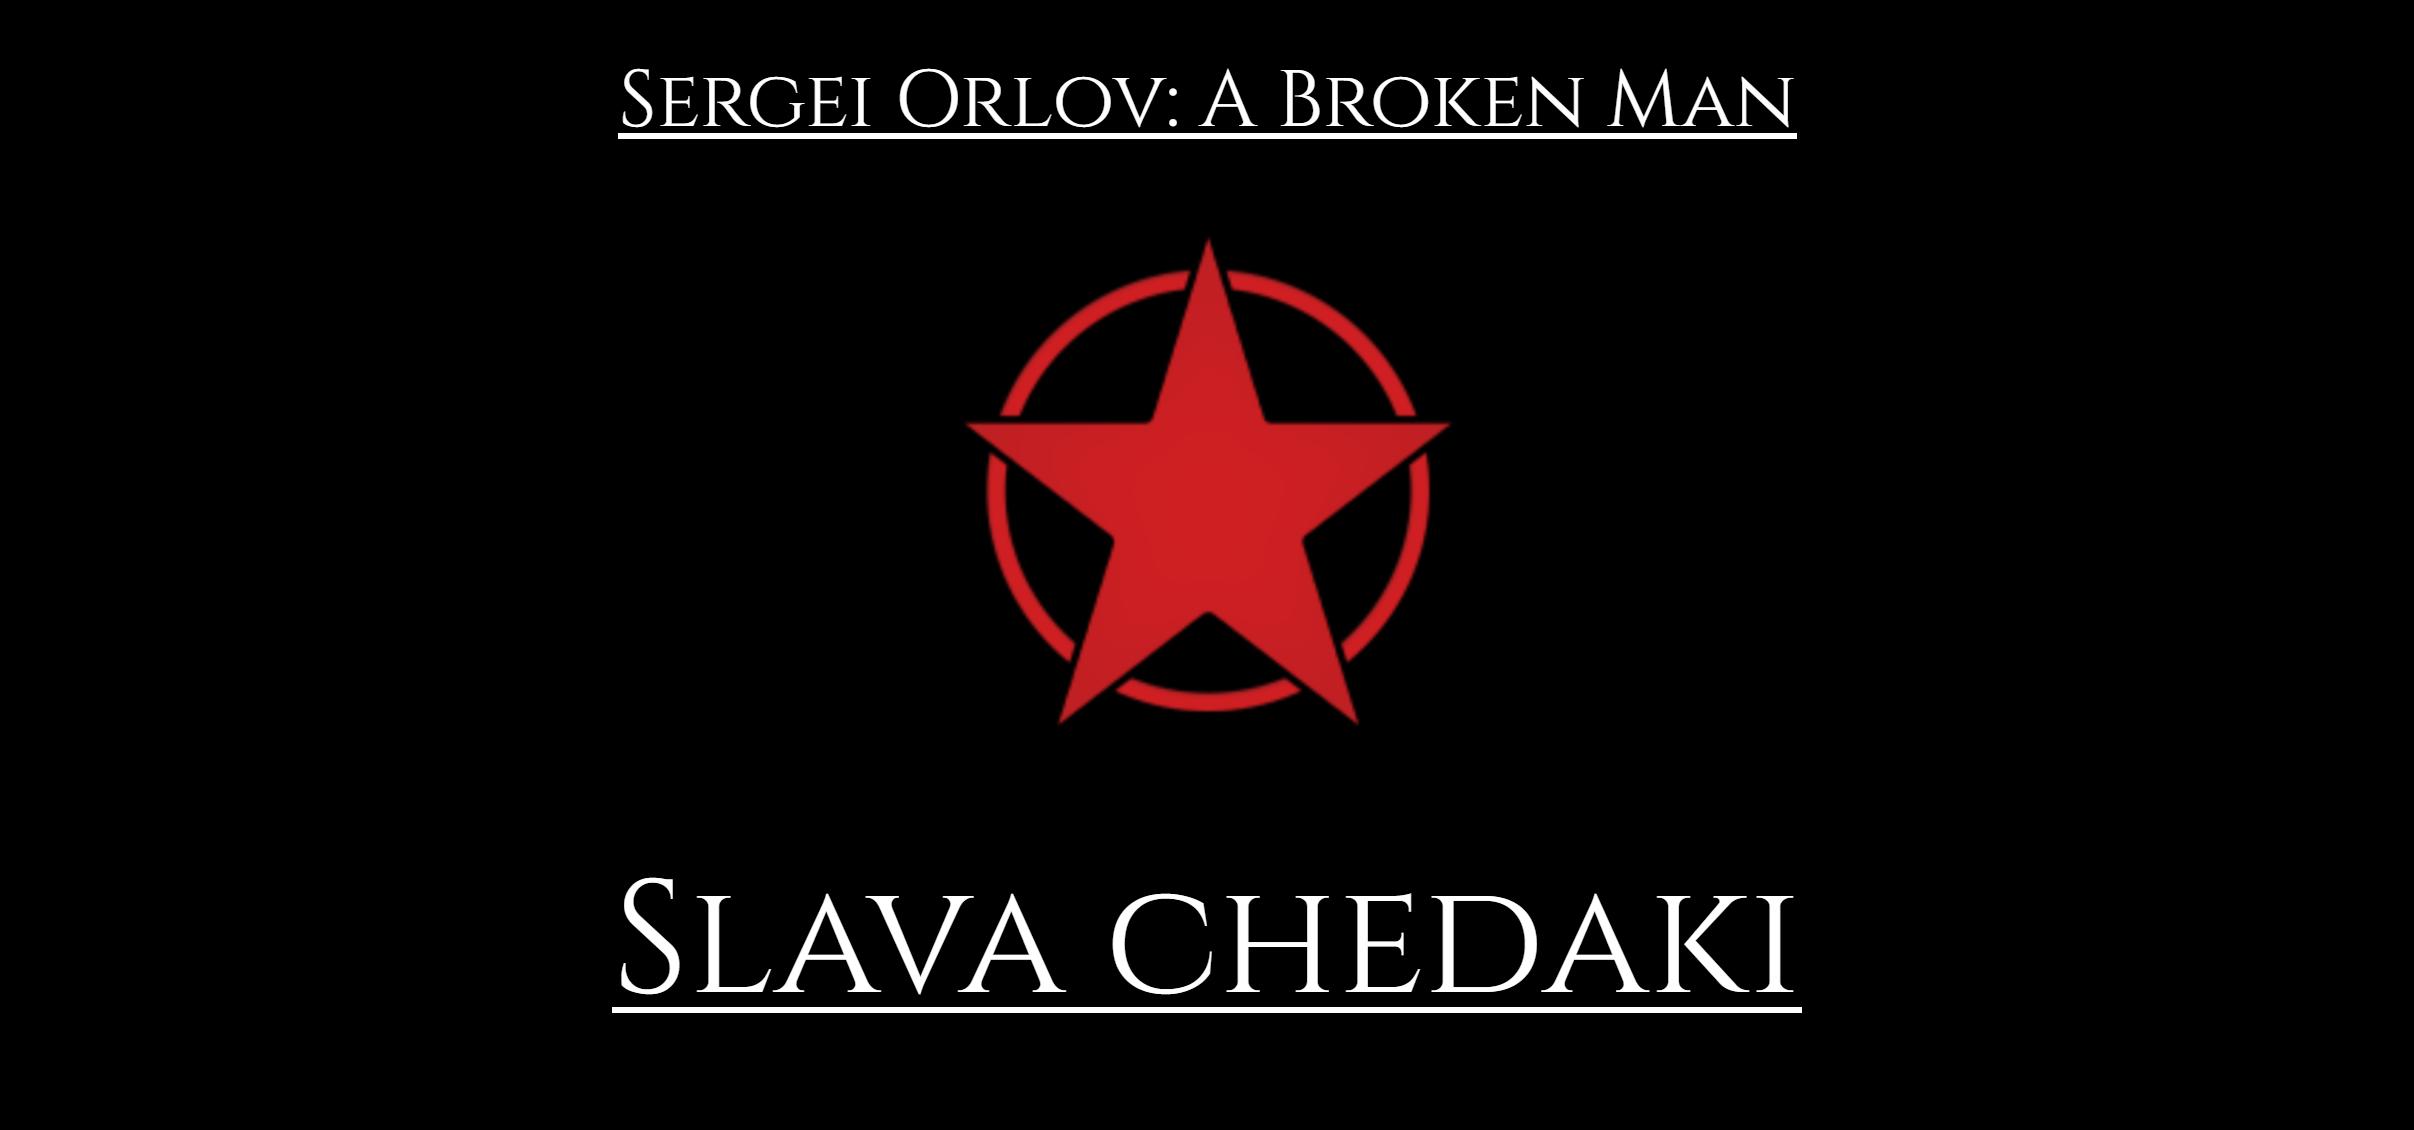 820399803_SergeiOrlovSlavaChedakiBig.png.dcc5bcc3a8901b972c8f11318789803a.png